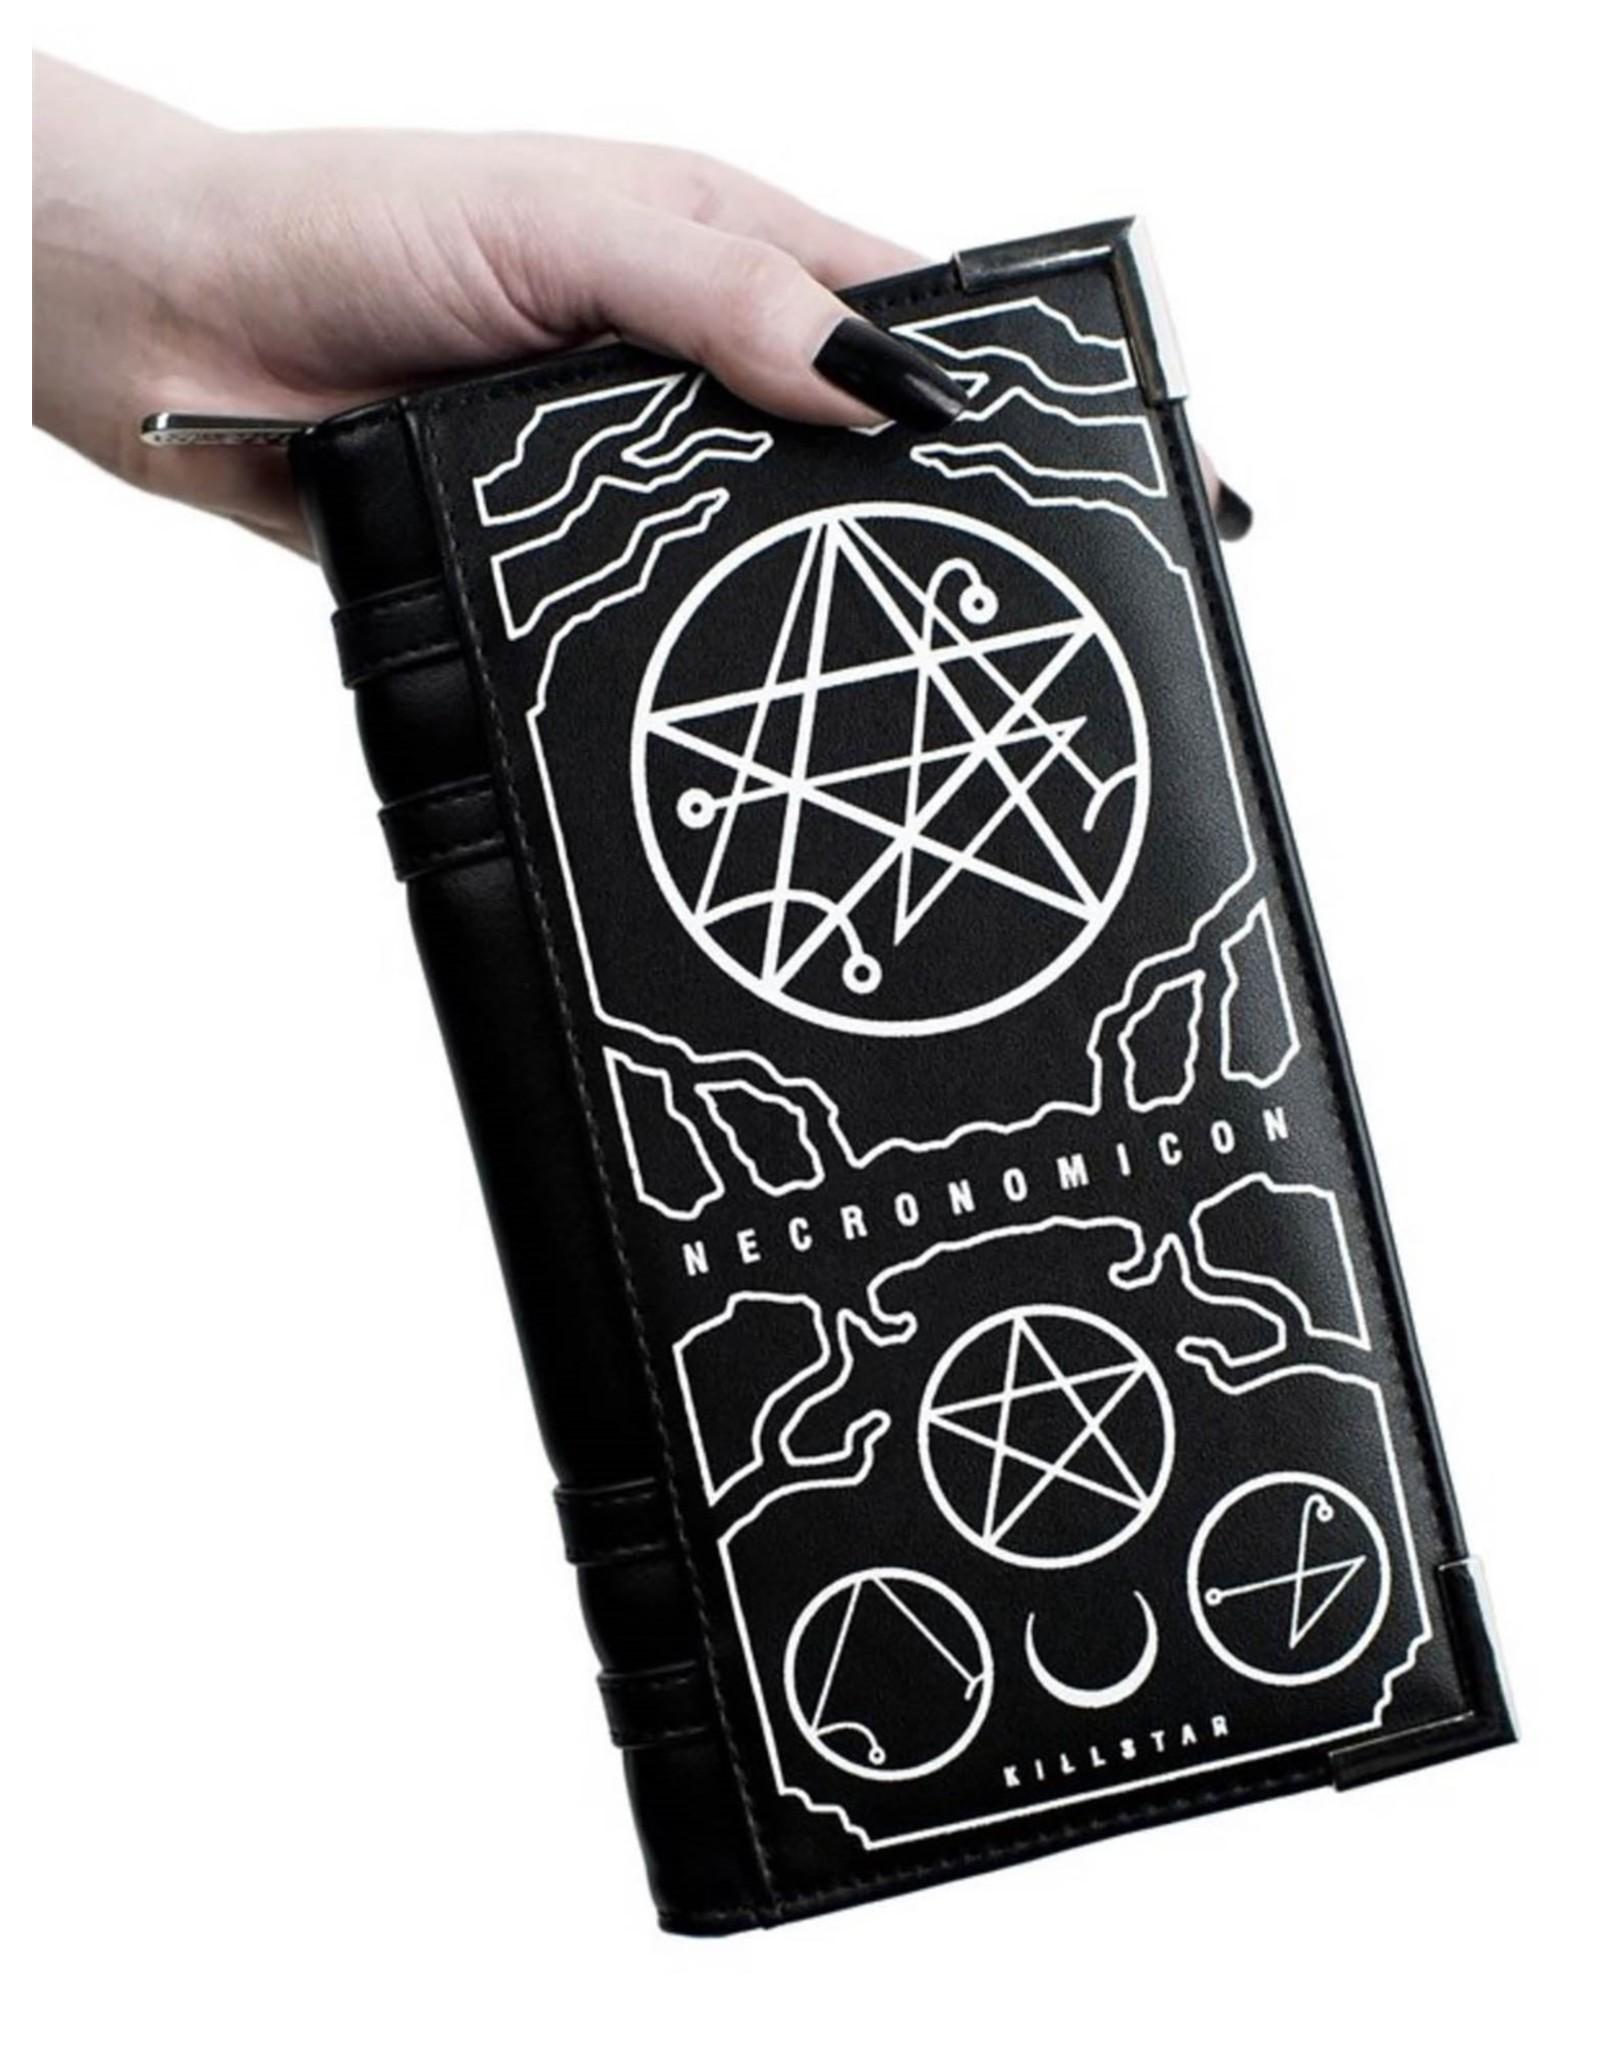 Killstar Killstar tassen en accessoires - Killstar Necronomicon portemonnee